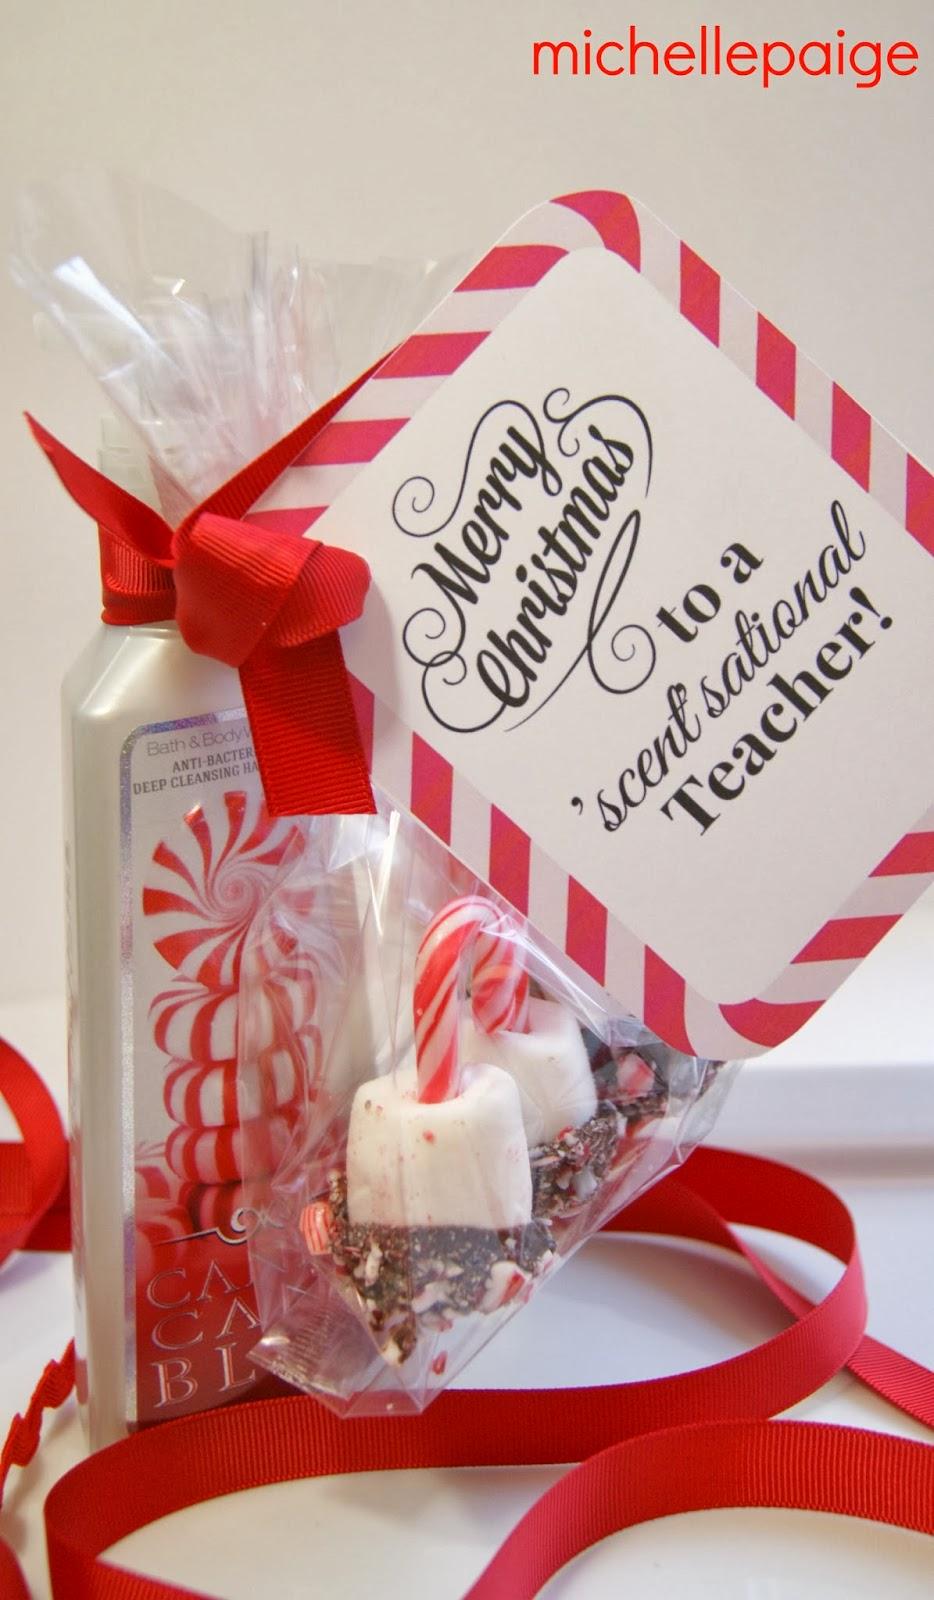 michelle paige blogs: Quick Teacher Soap Gift for Christmas